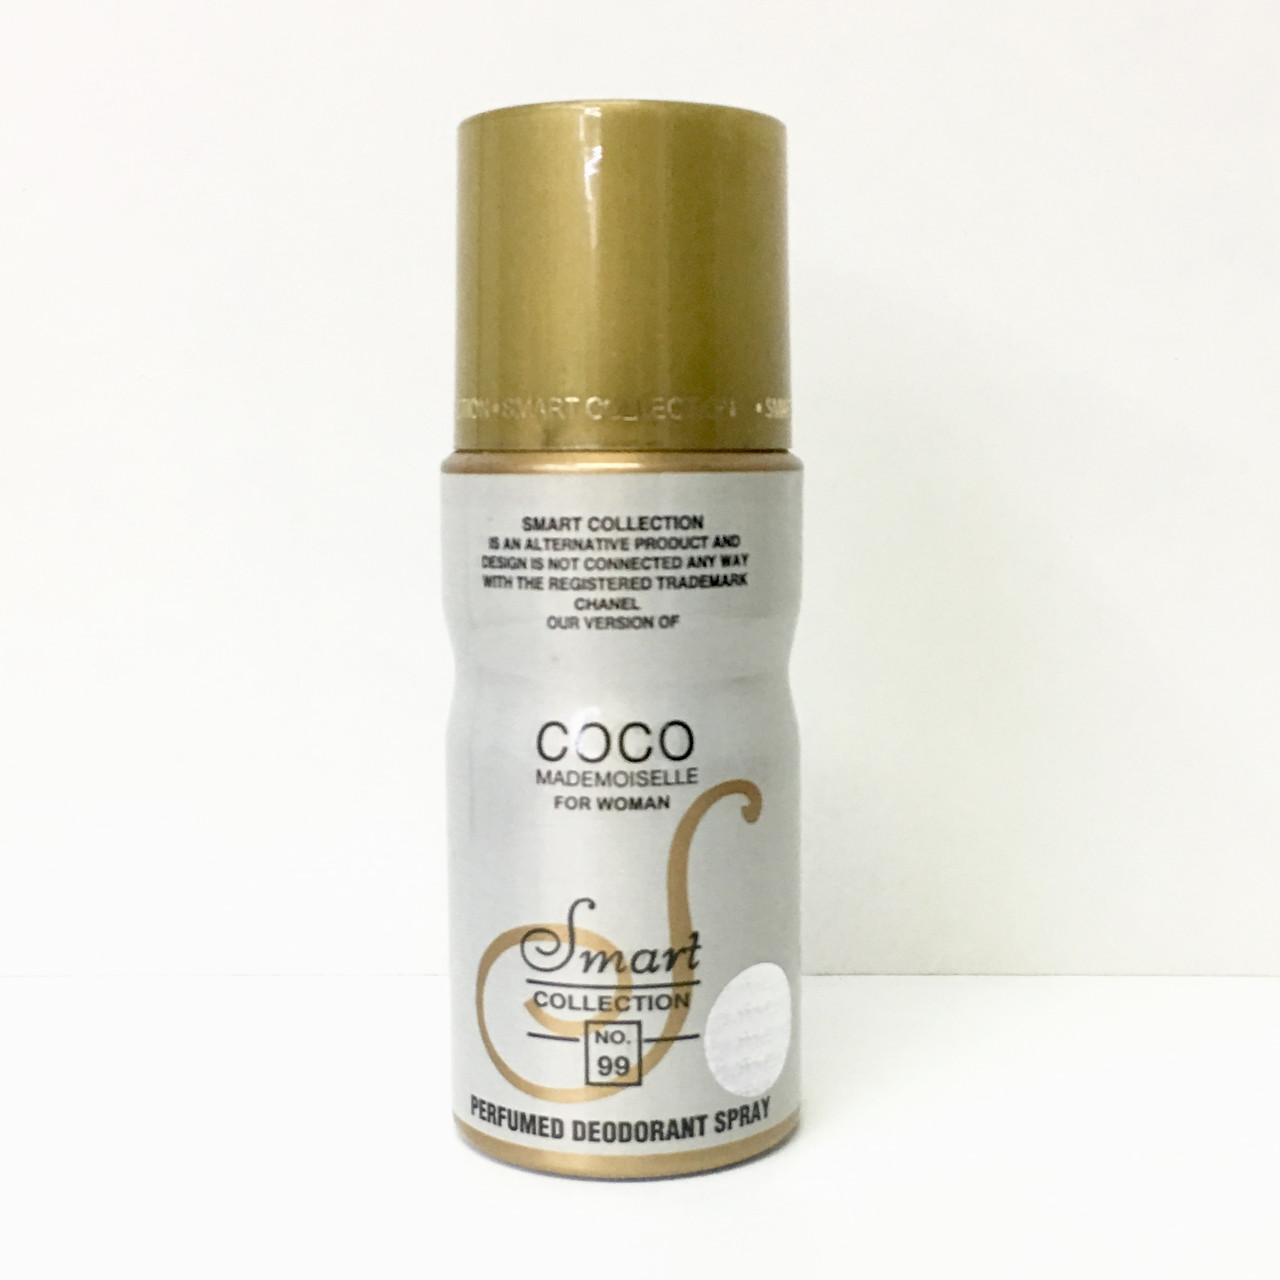 SMART COLLECTION Coco Mademoiselle (Смарт Колекшн Коко Мадмуазель) дезодорант - 150ml